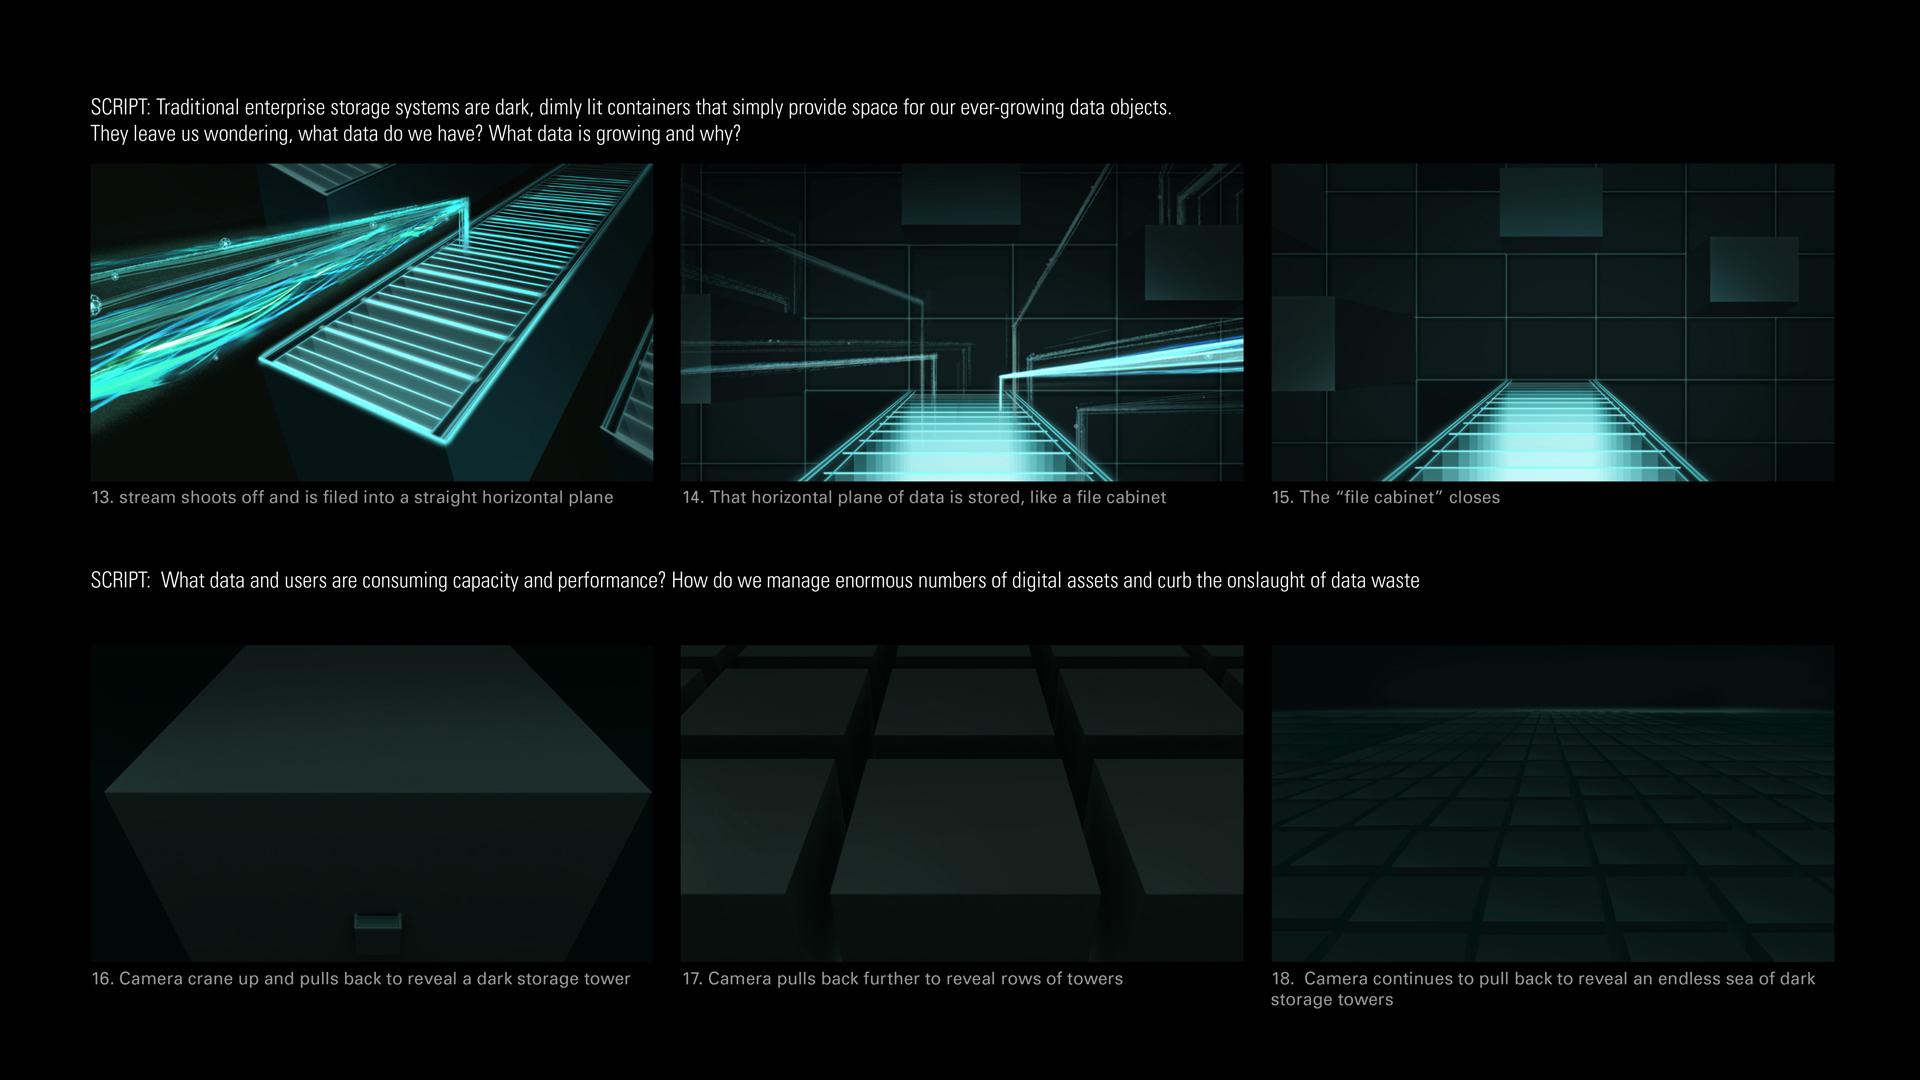 QML_Storyboards_003.jpg